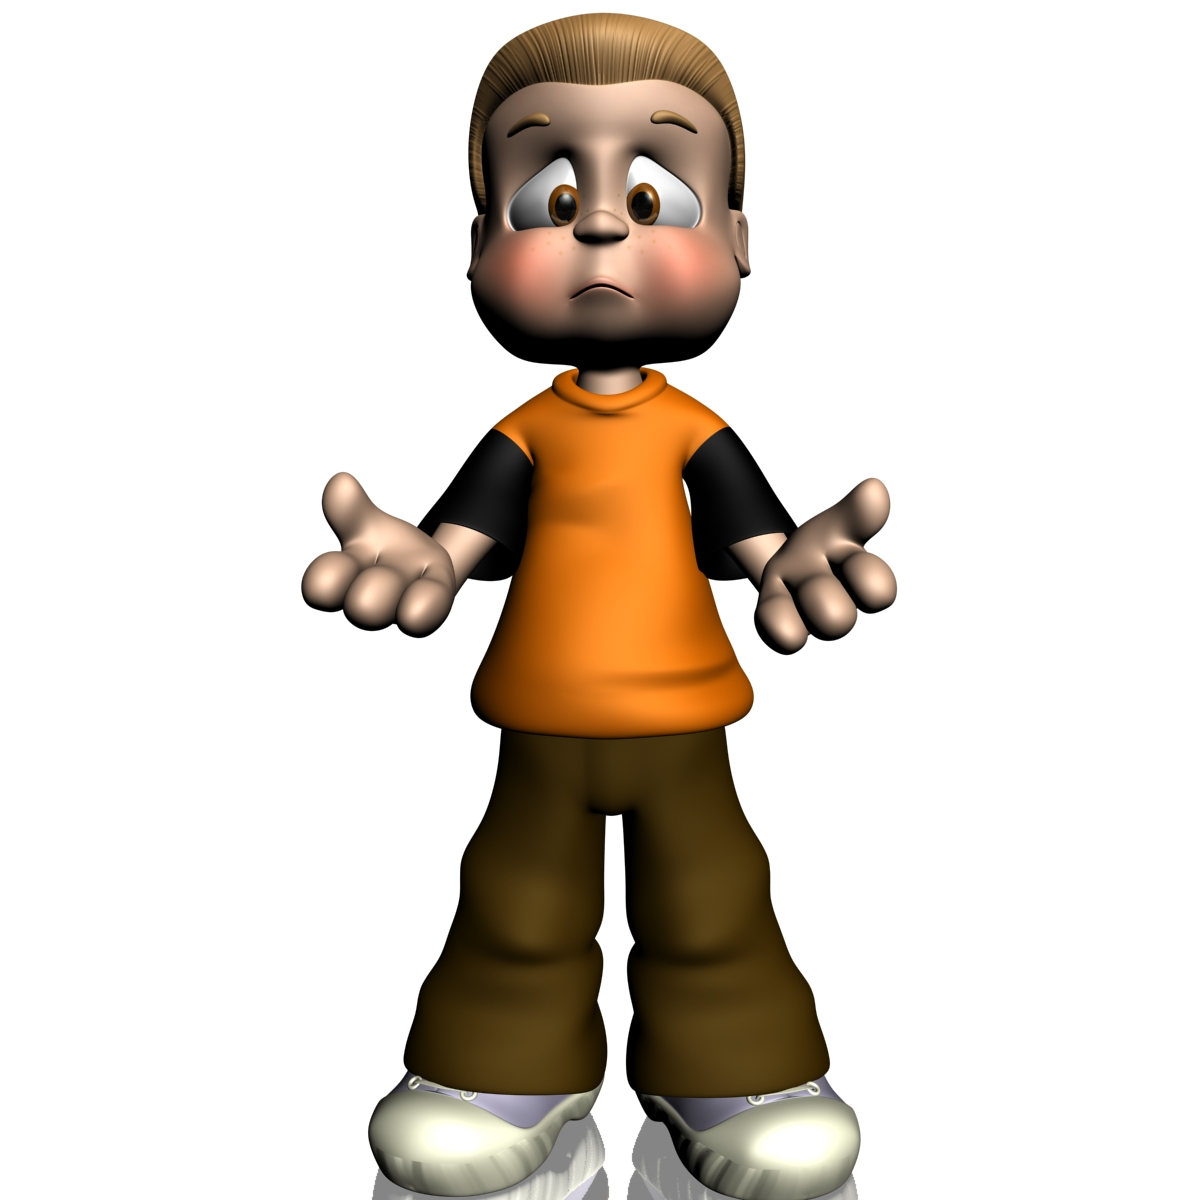 Cartoon Characters 3d Model : Cartoon boy rigged d model buy